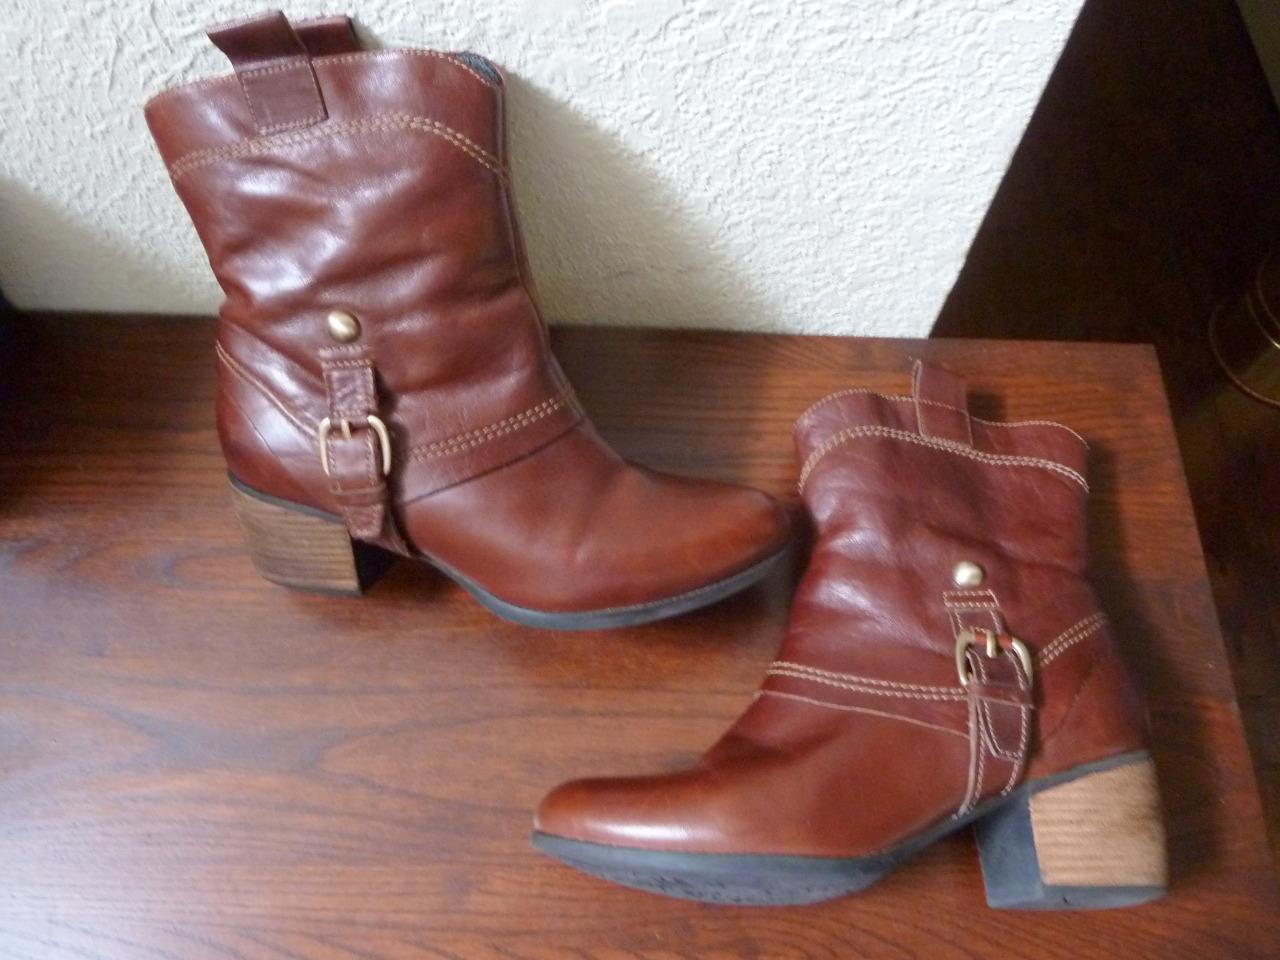 CLARKS Artisan Damenschuhe 7M Braun Leder Straps Buckles Studs Fashion Ankle Stiefel